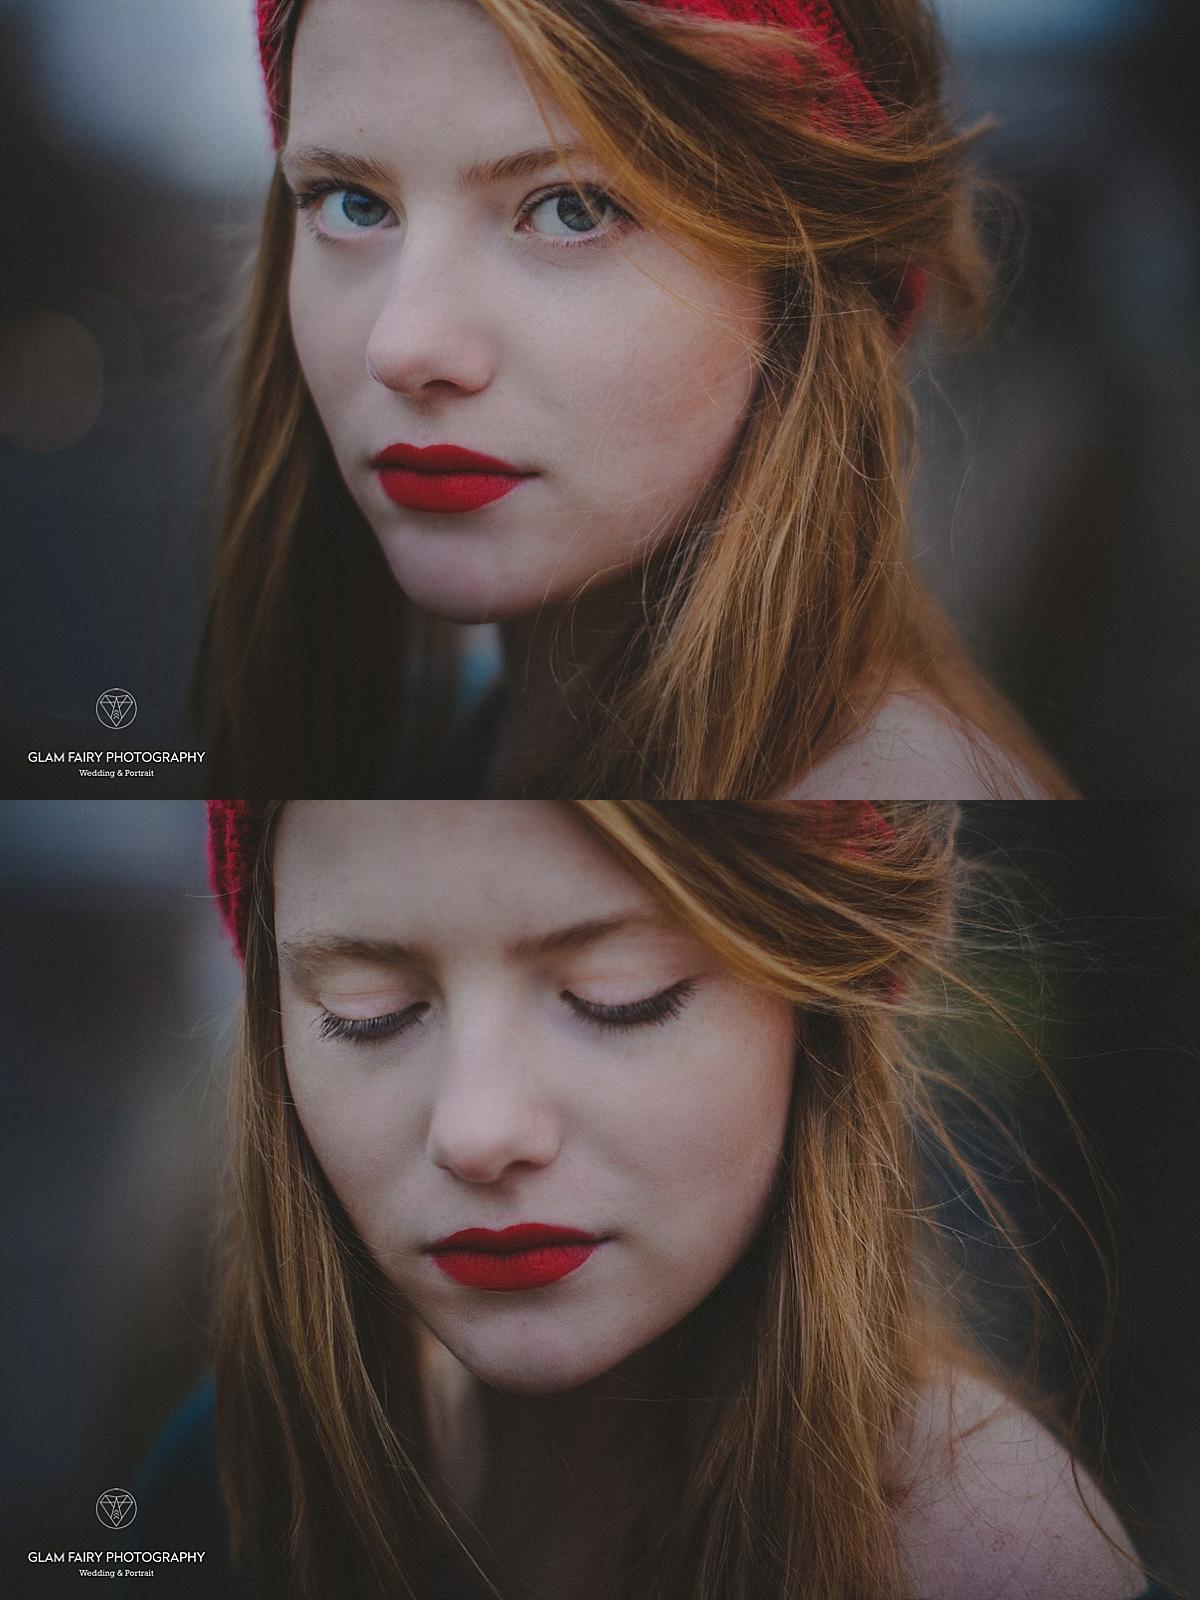 GlamFairyPhotography-seance-portrait-femme-bnf-mona_0009